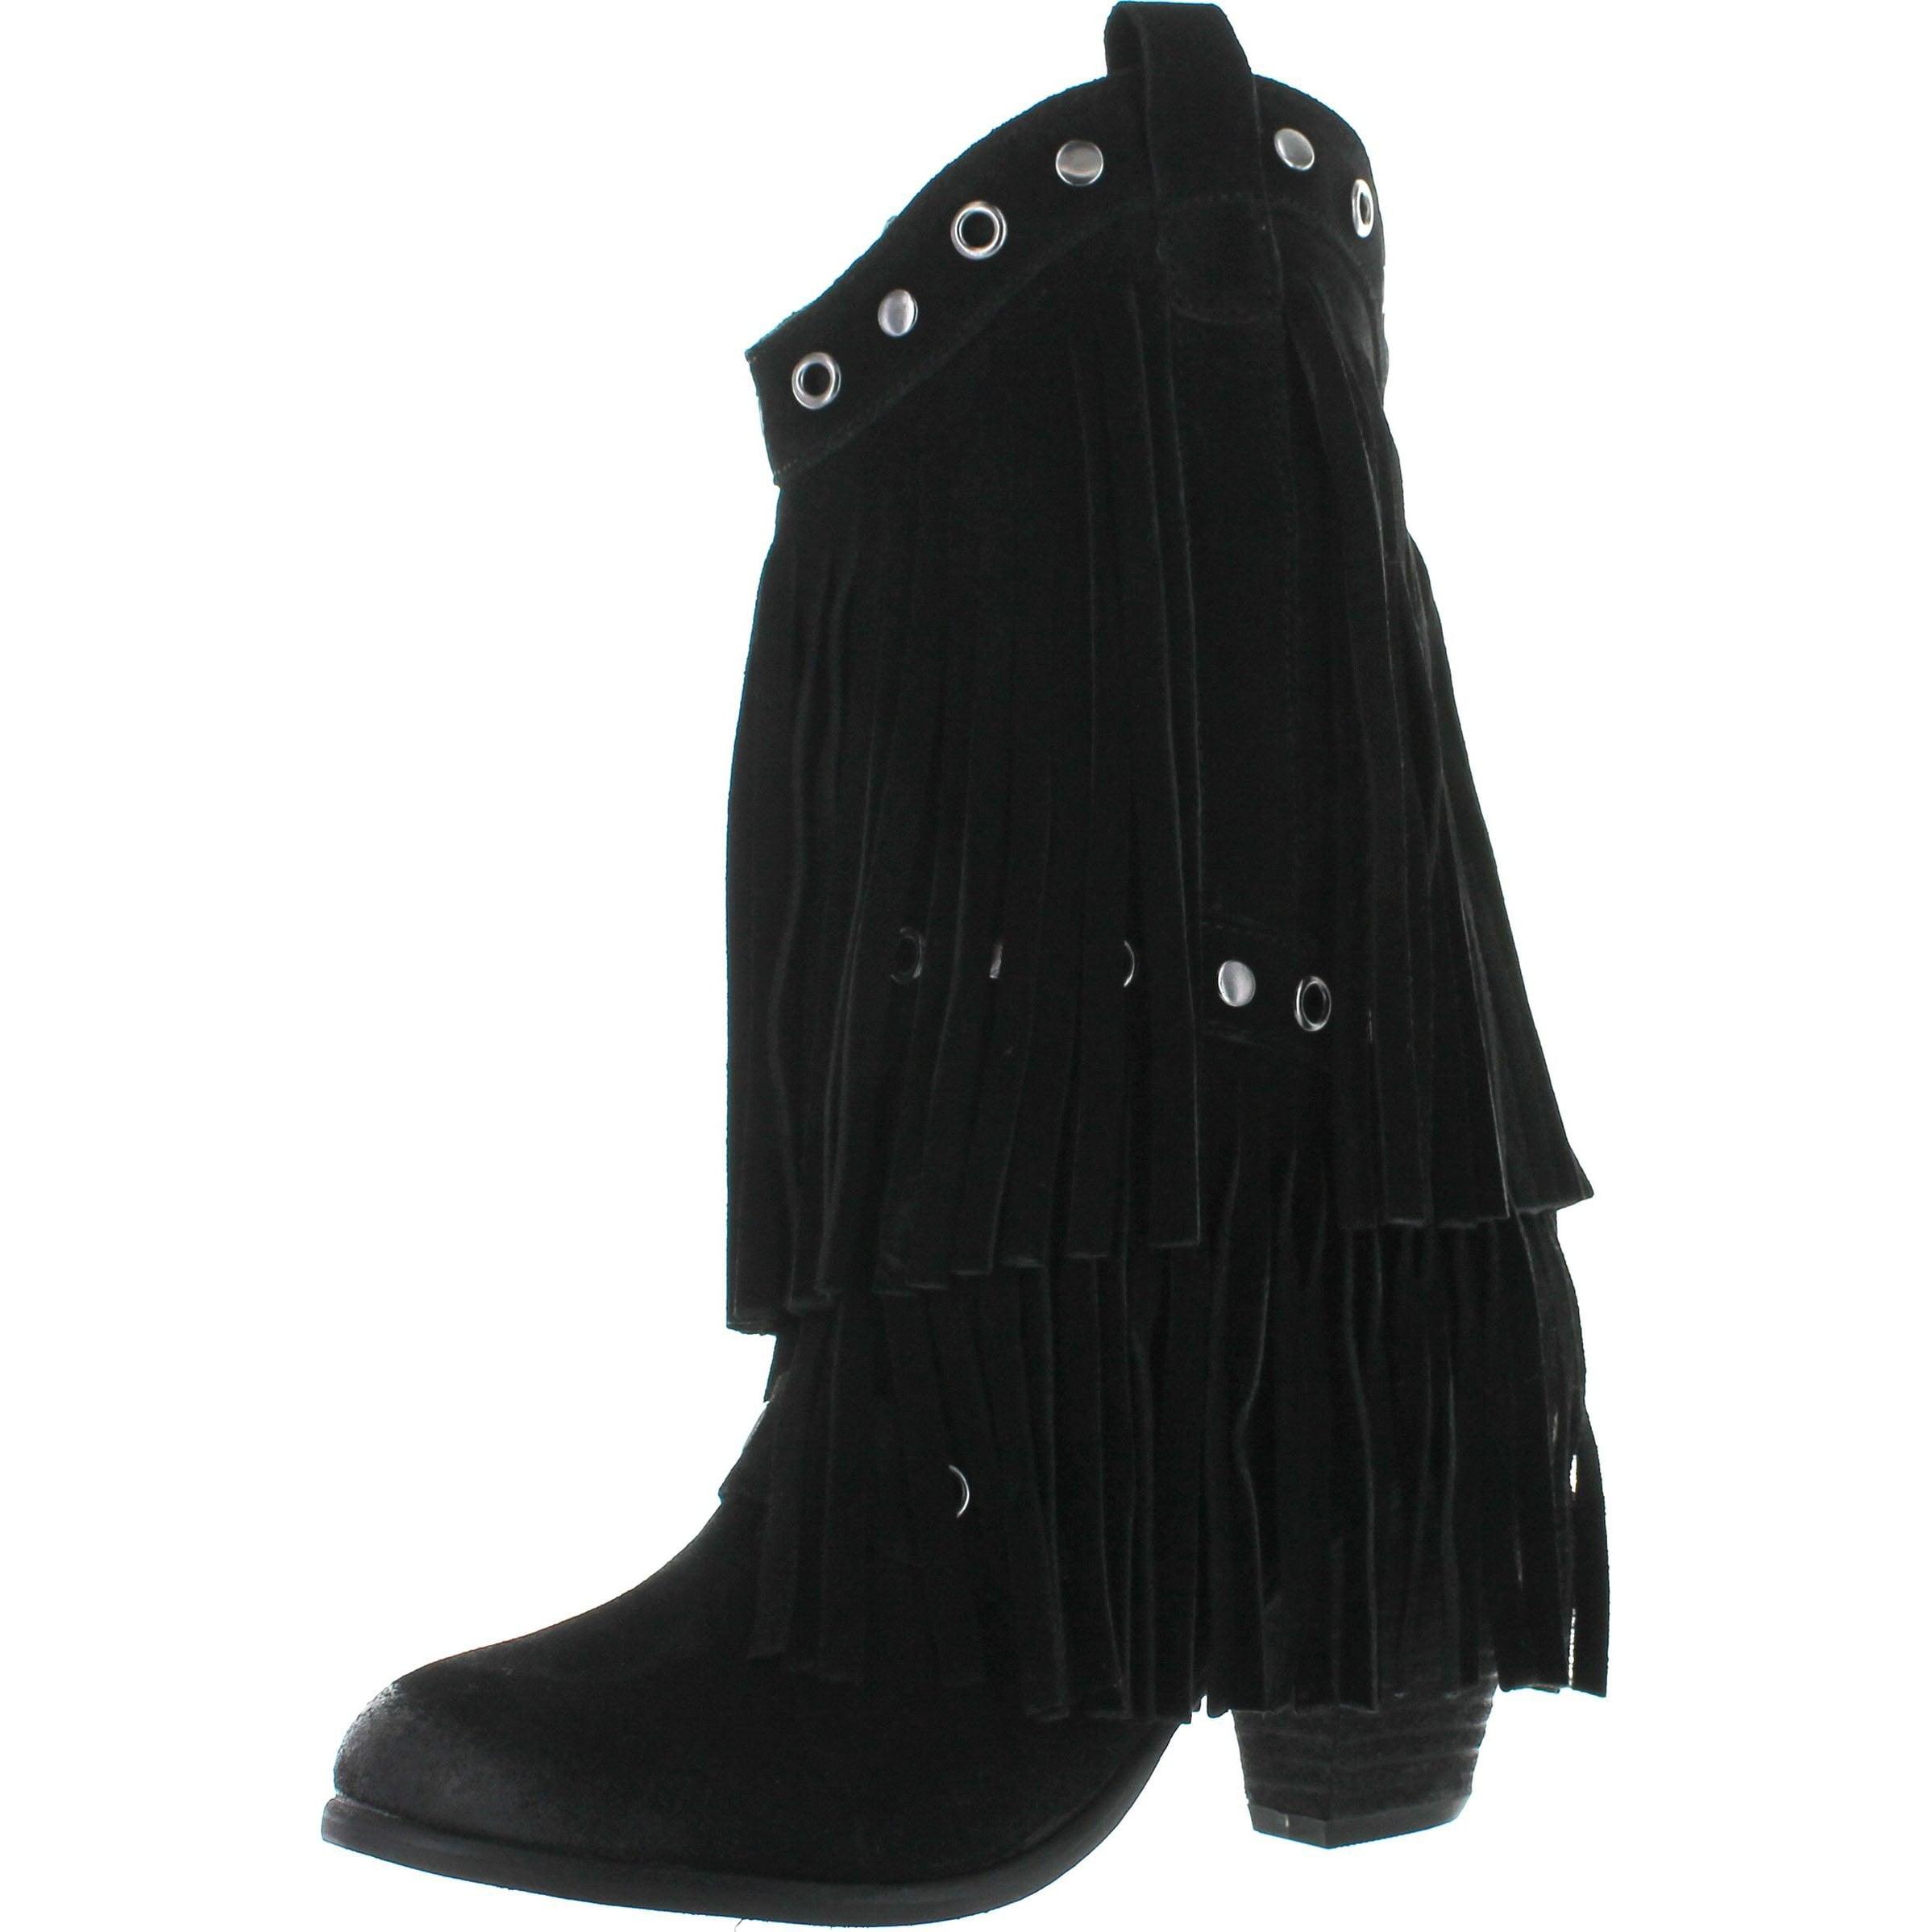 Shop Naughty Monkey Women s Kickin It Boots - Free Shipping Today ... 692d2aca57c7